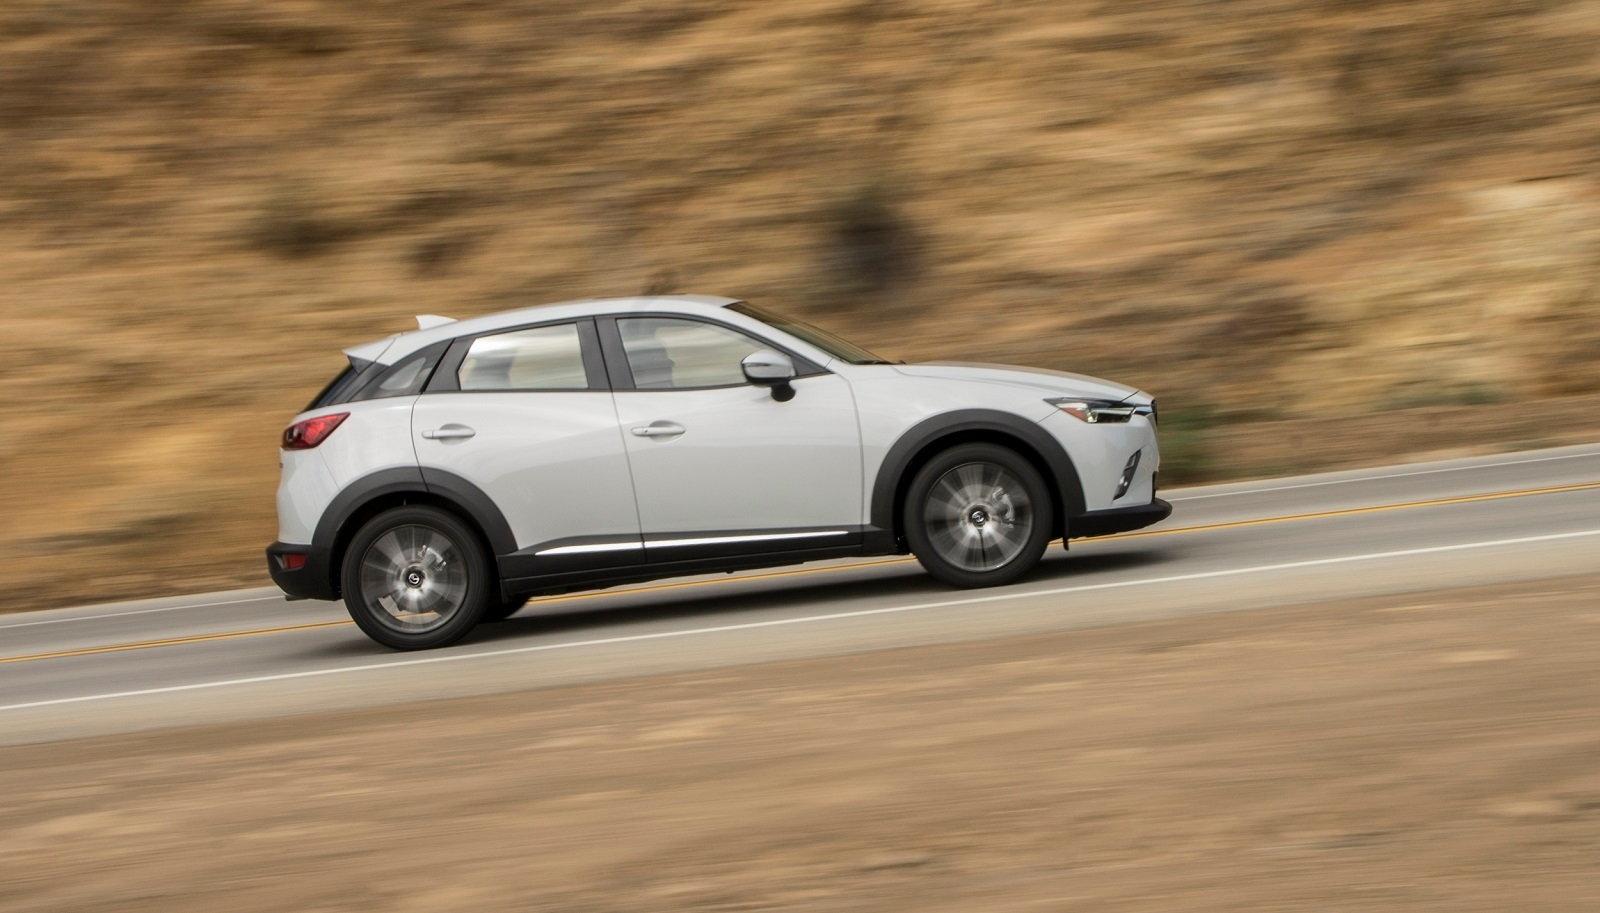 2016 Mazda CX-3 Review - CarsDirect